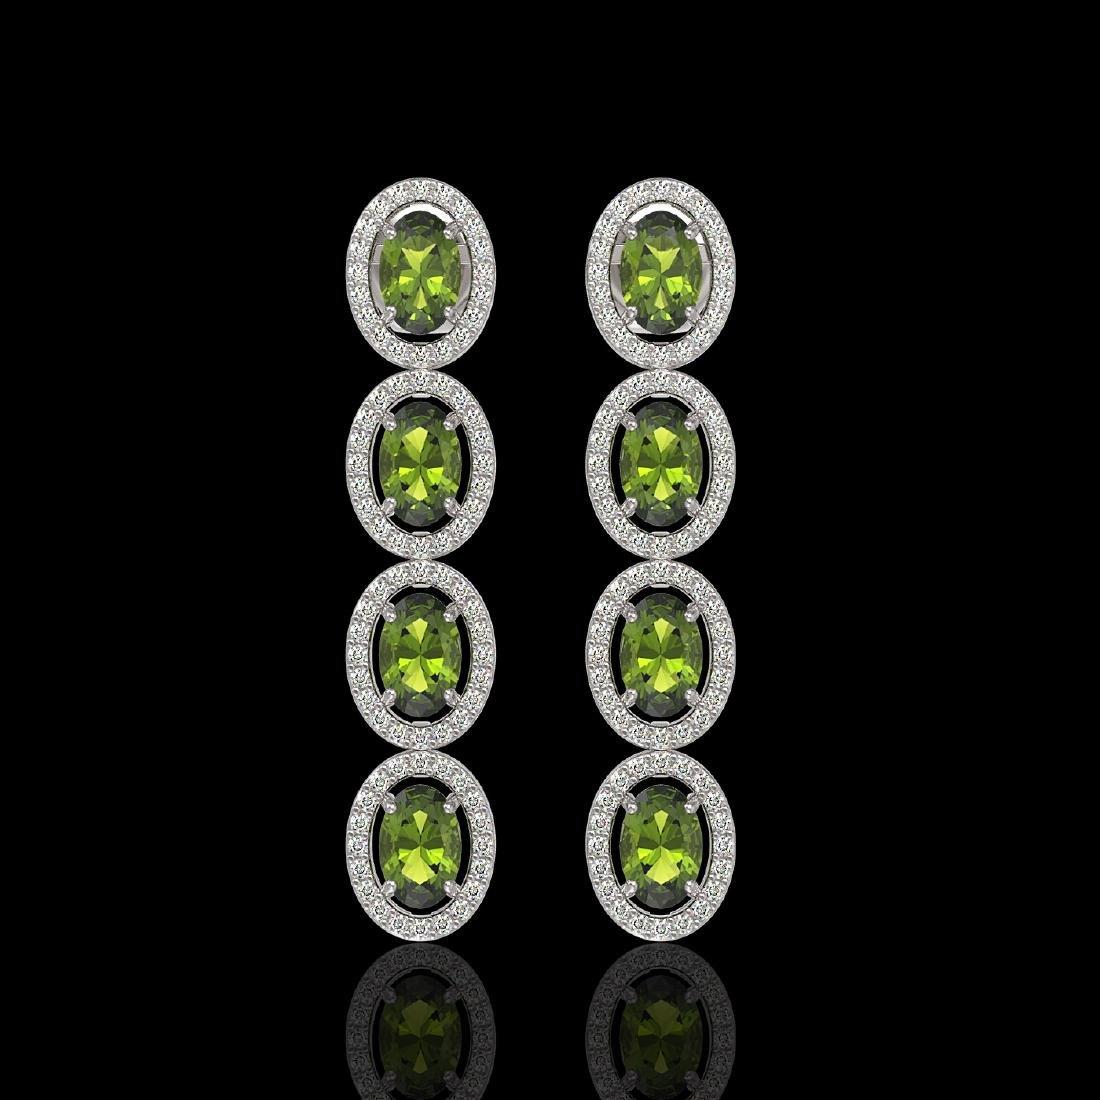 5.88 CTW Tourmaline & Diamond Halo Earrings 10K White